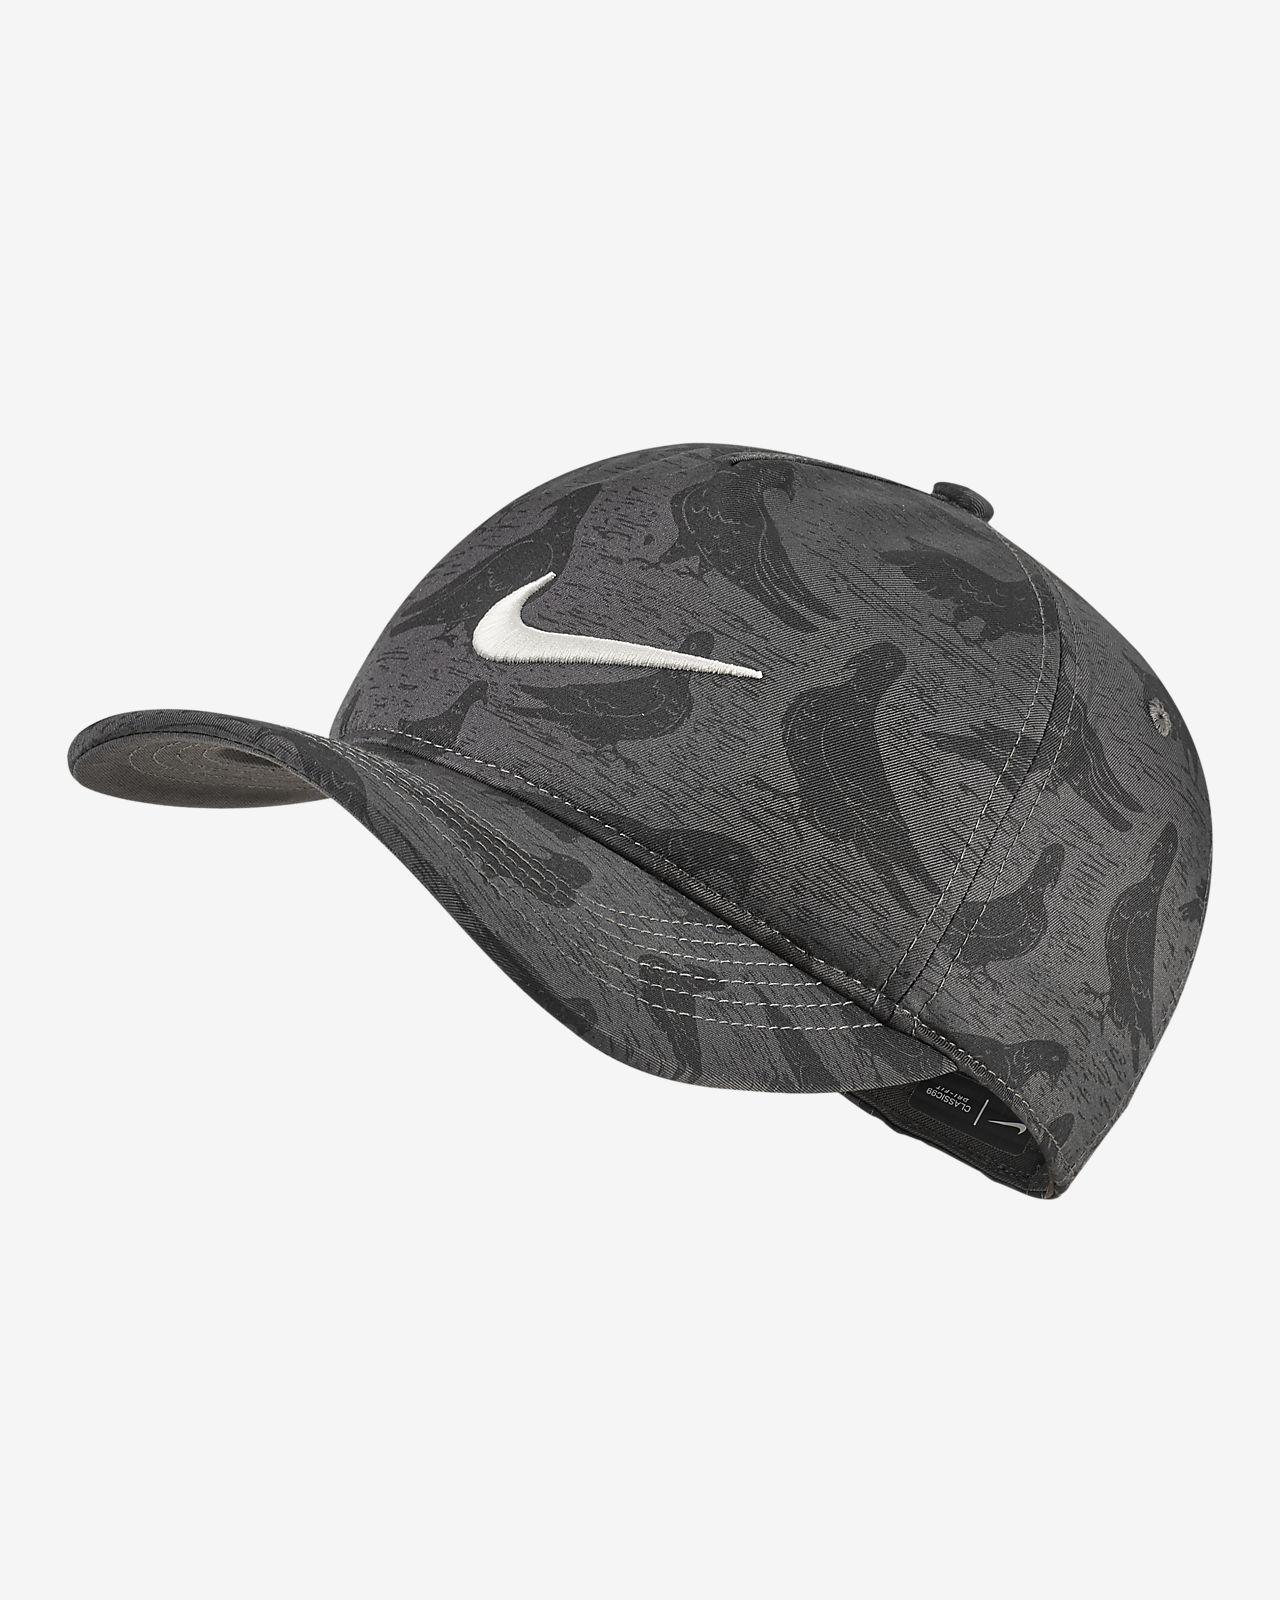 2bb9031011afb Nike AeroBill Classic99 Printed Golf Hat. Nike.com